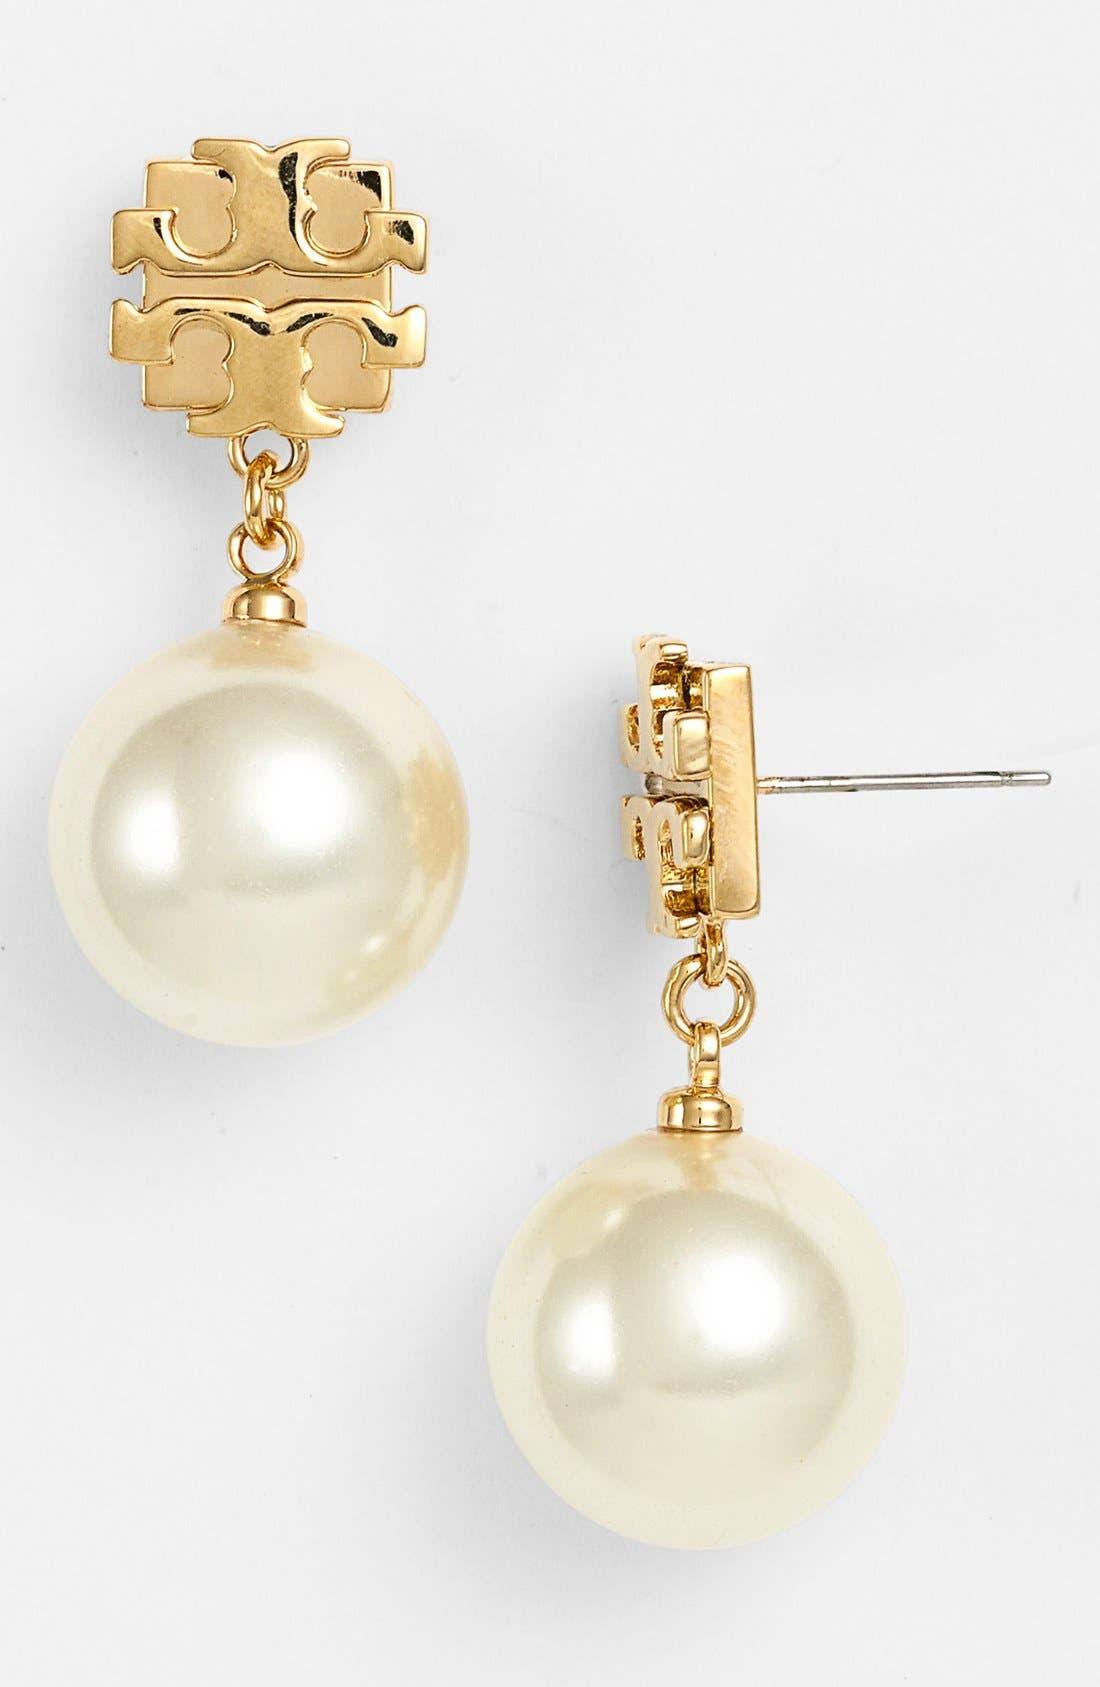 Alternate Image 1 Selected - Tory Burch 'Evie' Logo Pearl Drop Earrings